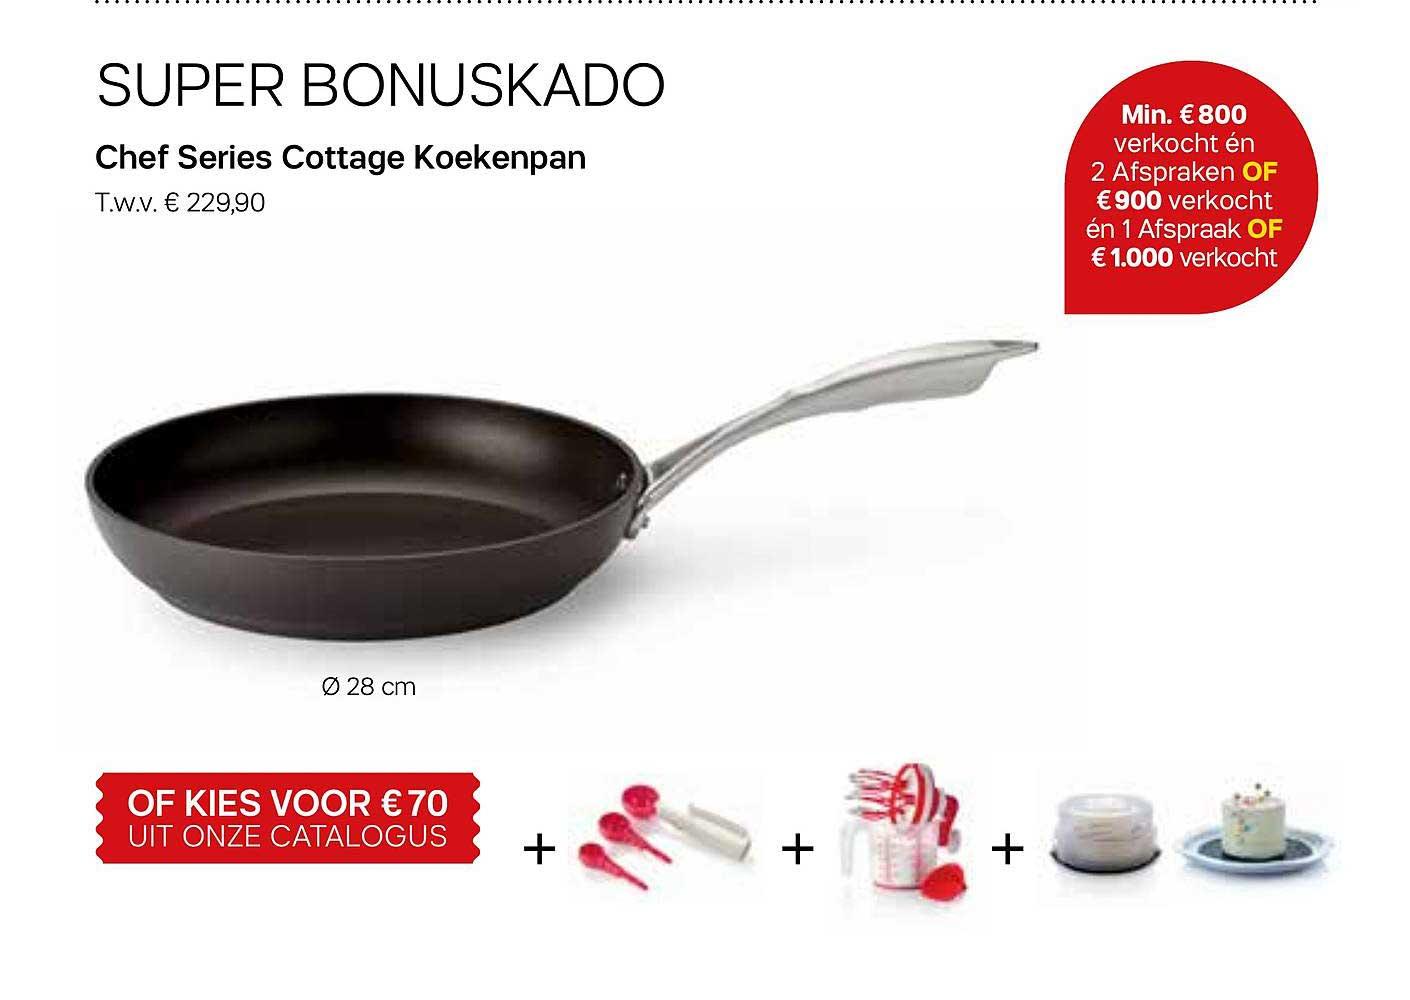 Tupperware Chef Series Cottage Koekenpan